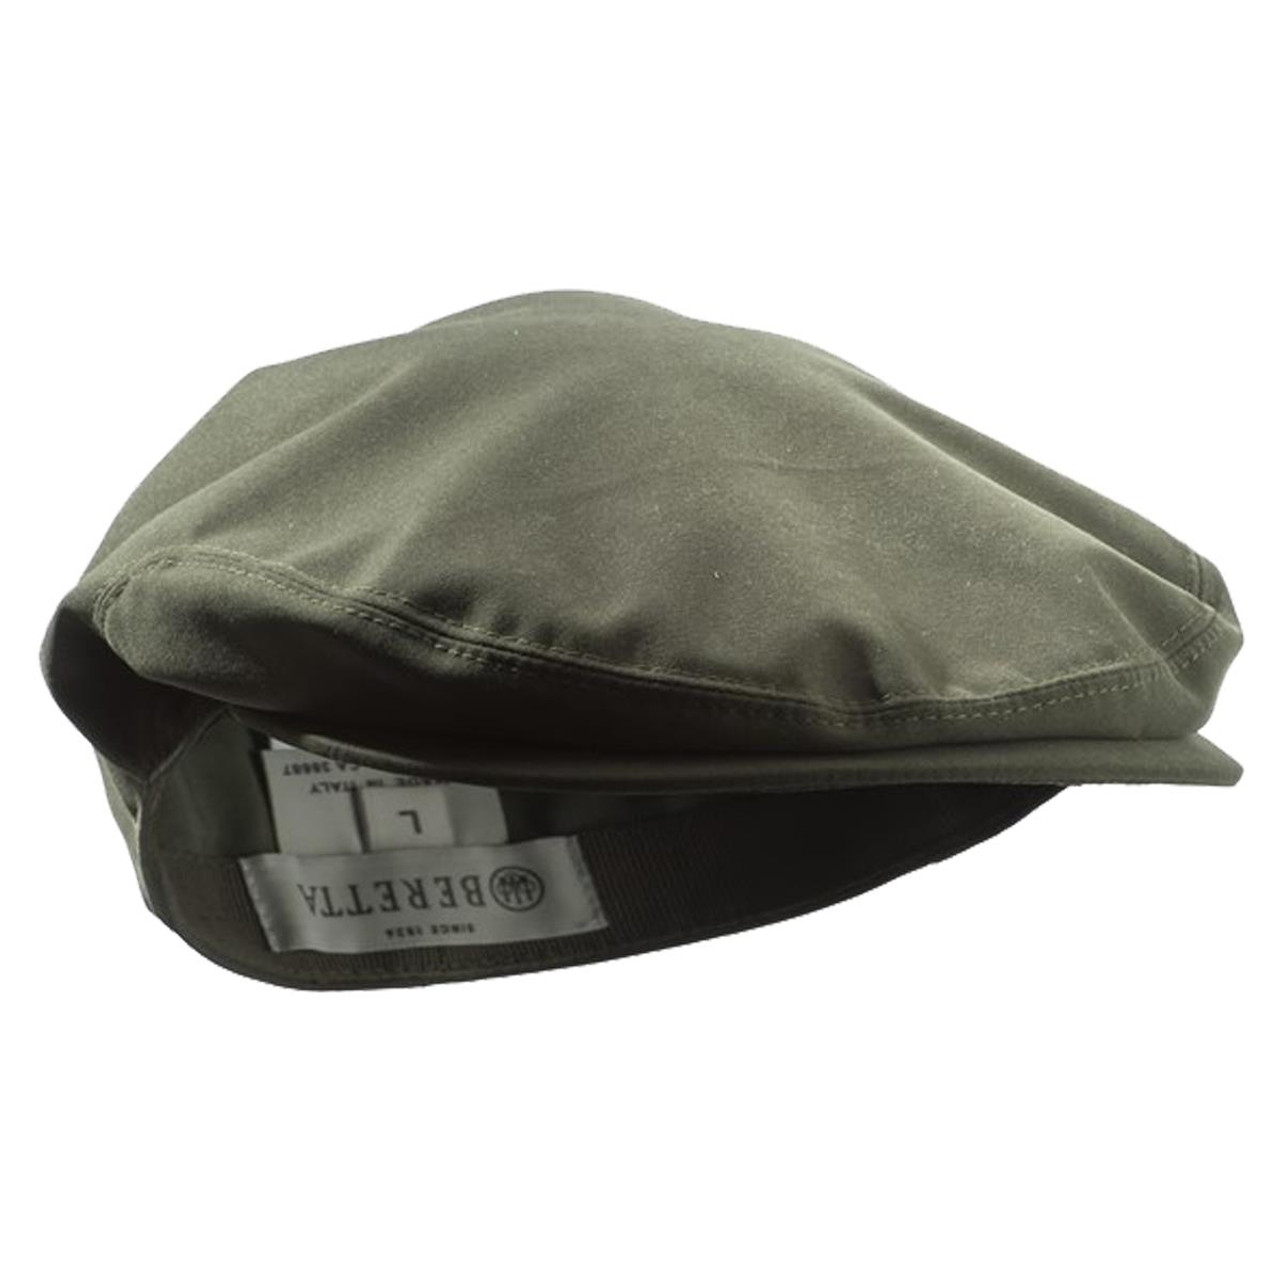 Waterproof Flat Cap